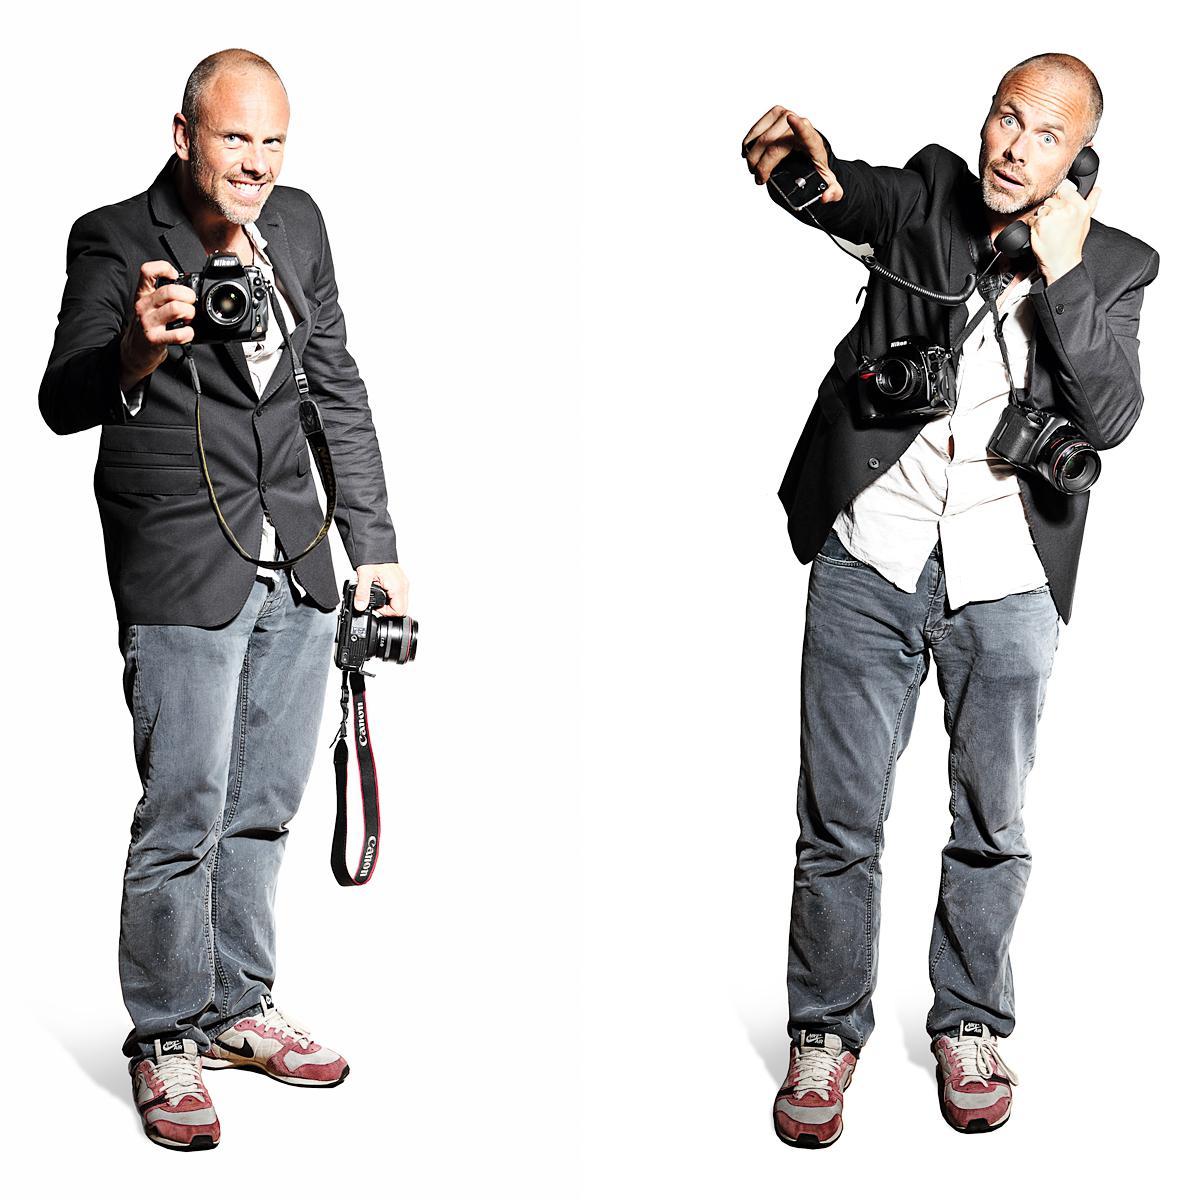 Portrait of Fredrik Bond, Director of Shots Magazine by London photographer Julian Hanford